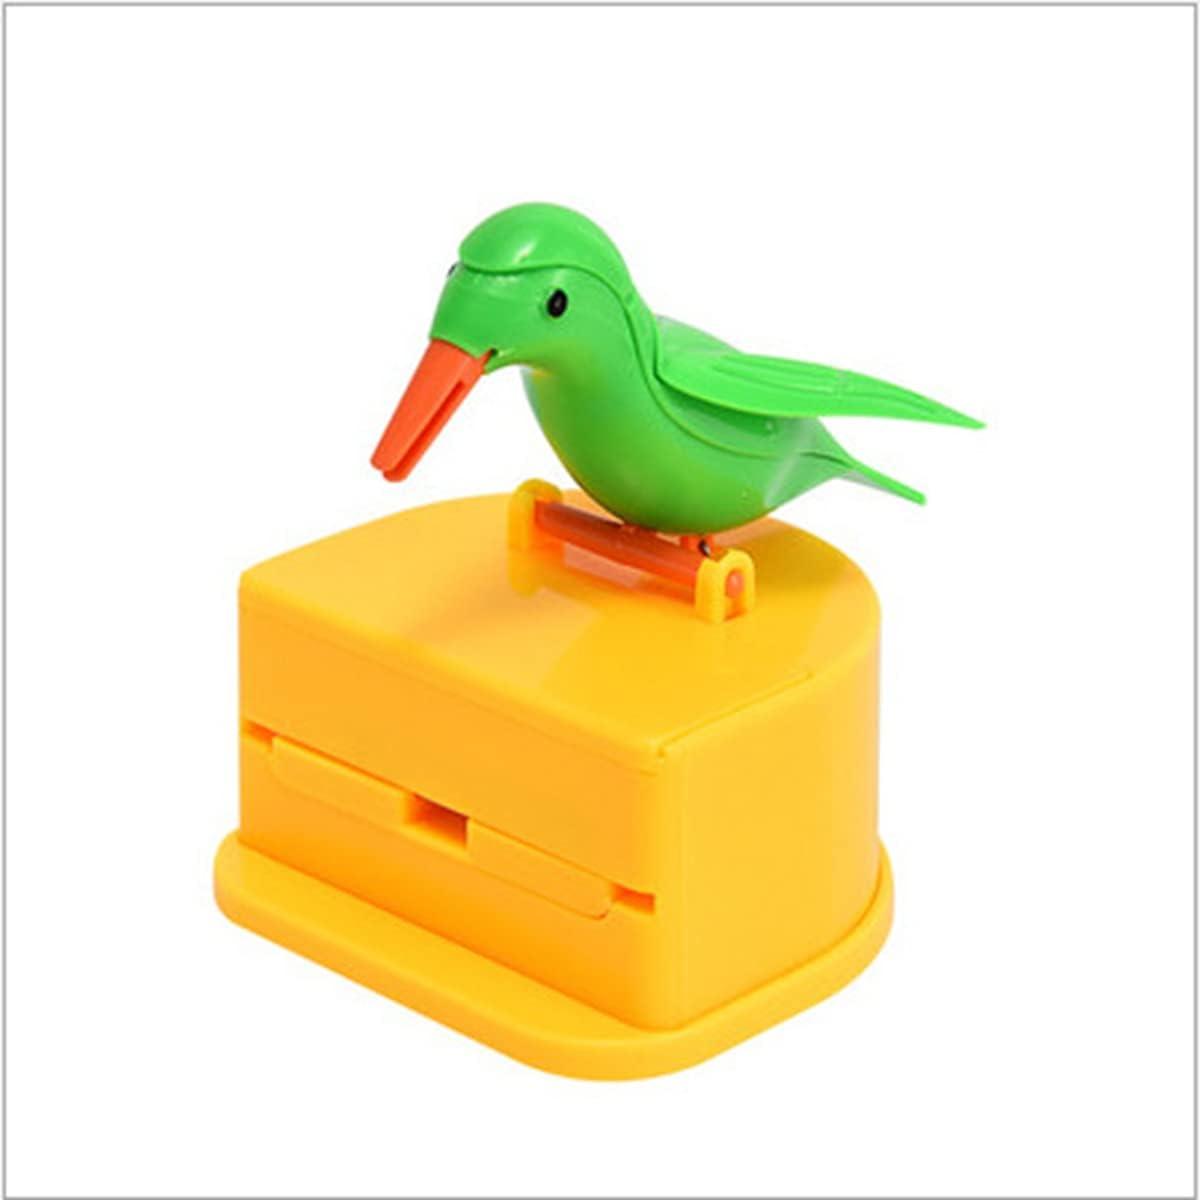 WDXIN Toothpick Dispenser Bird Box Funny Portable Max 40% Las Vegas Mall OFF Plas